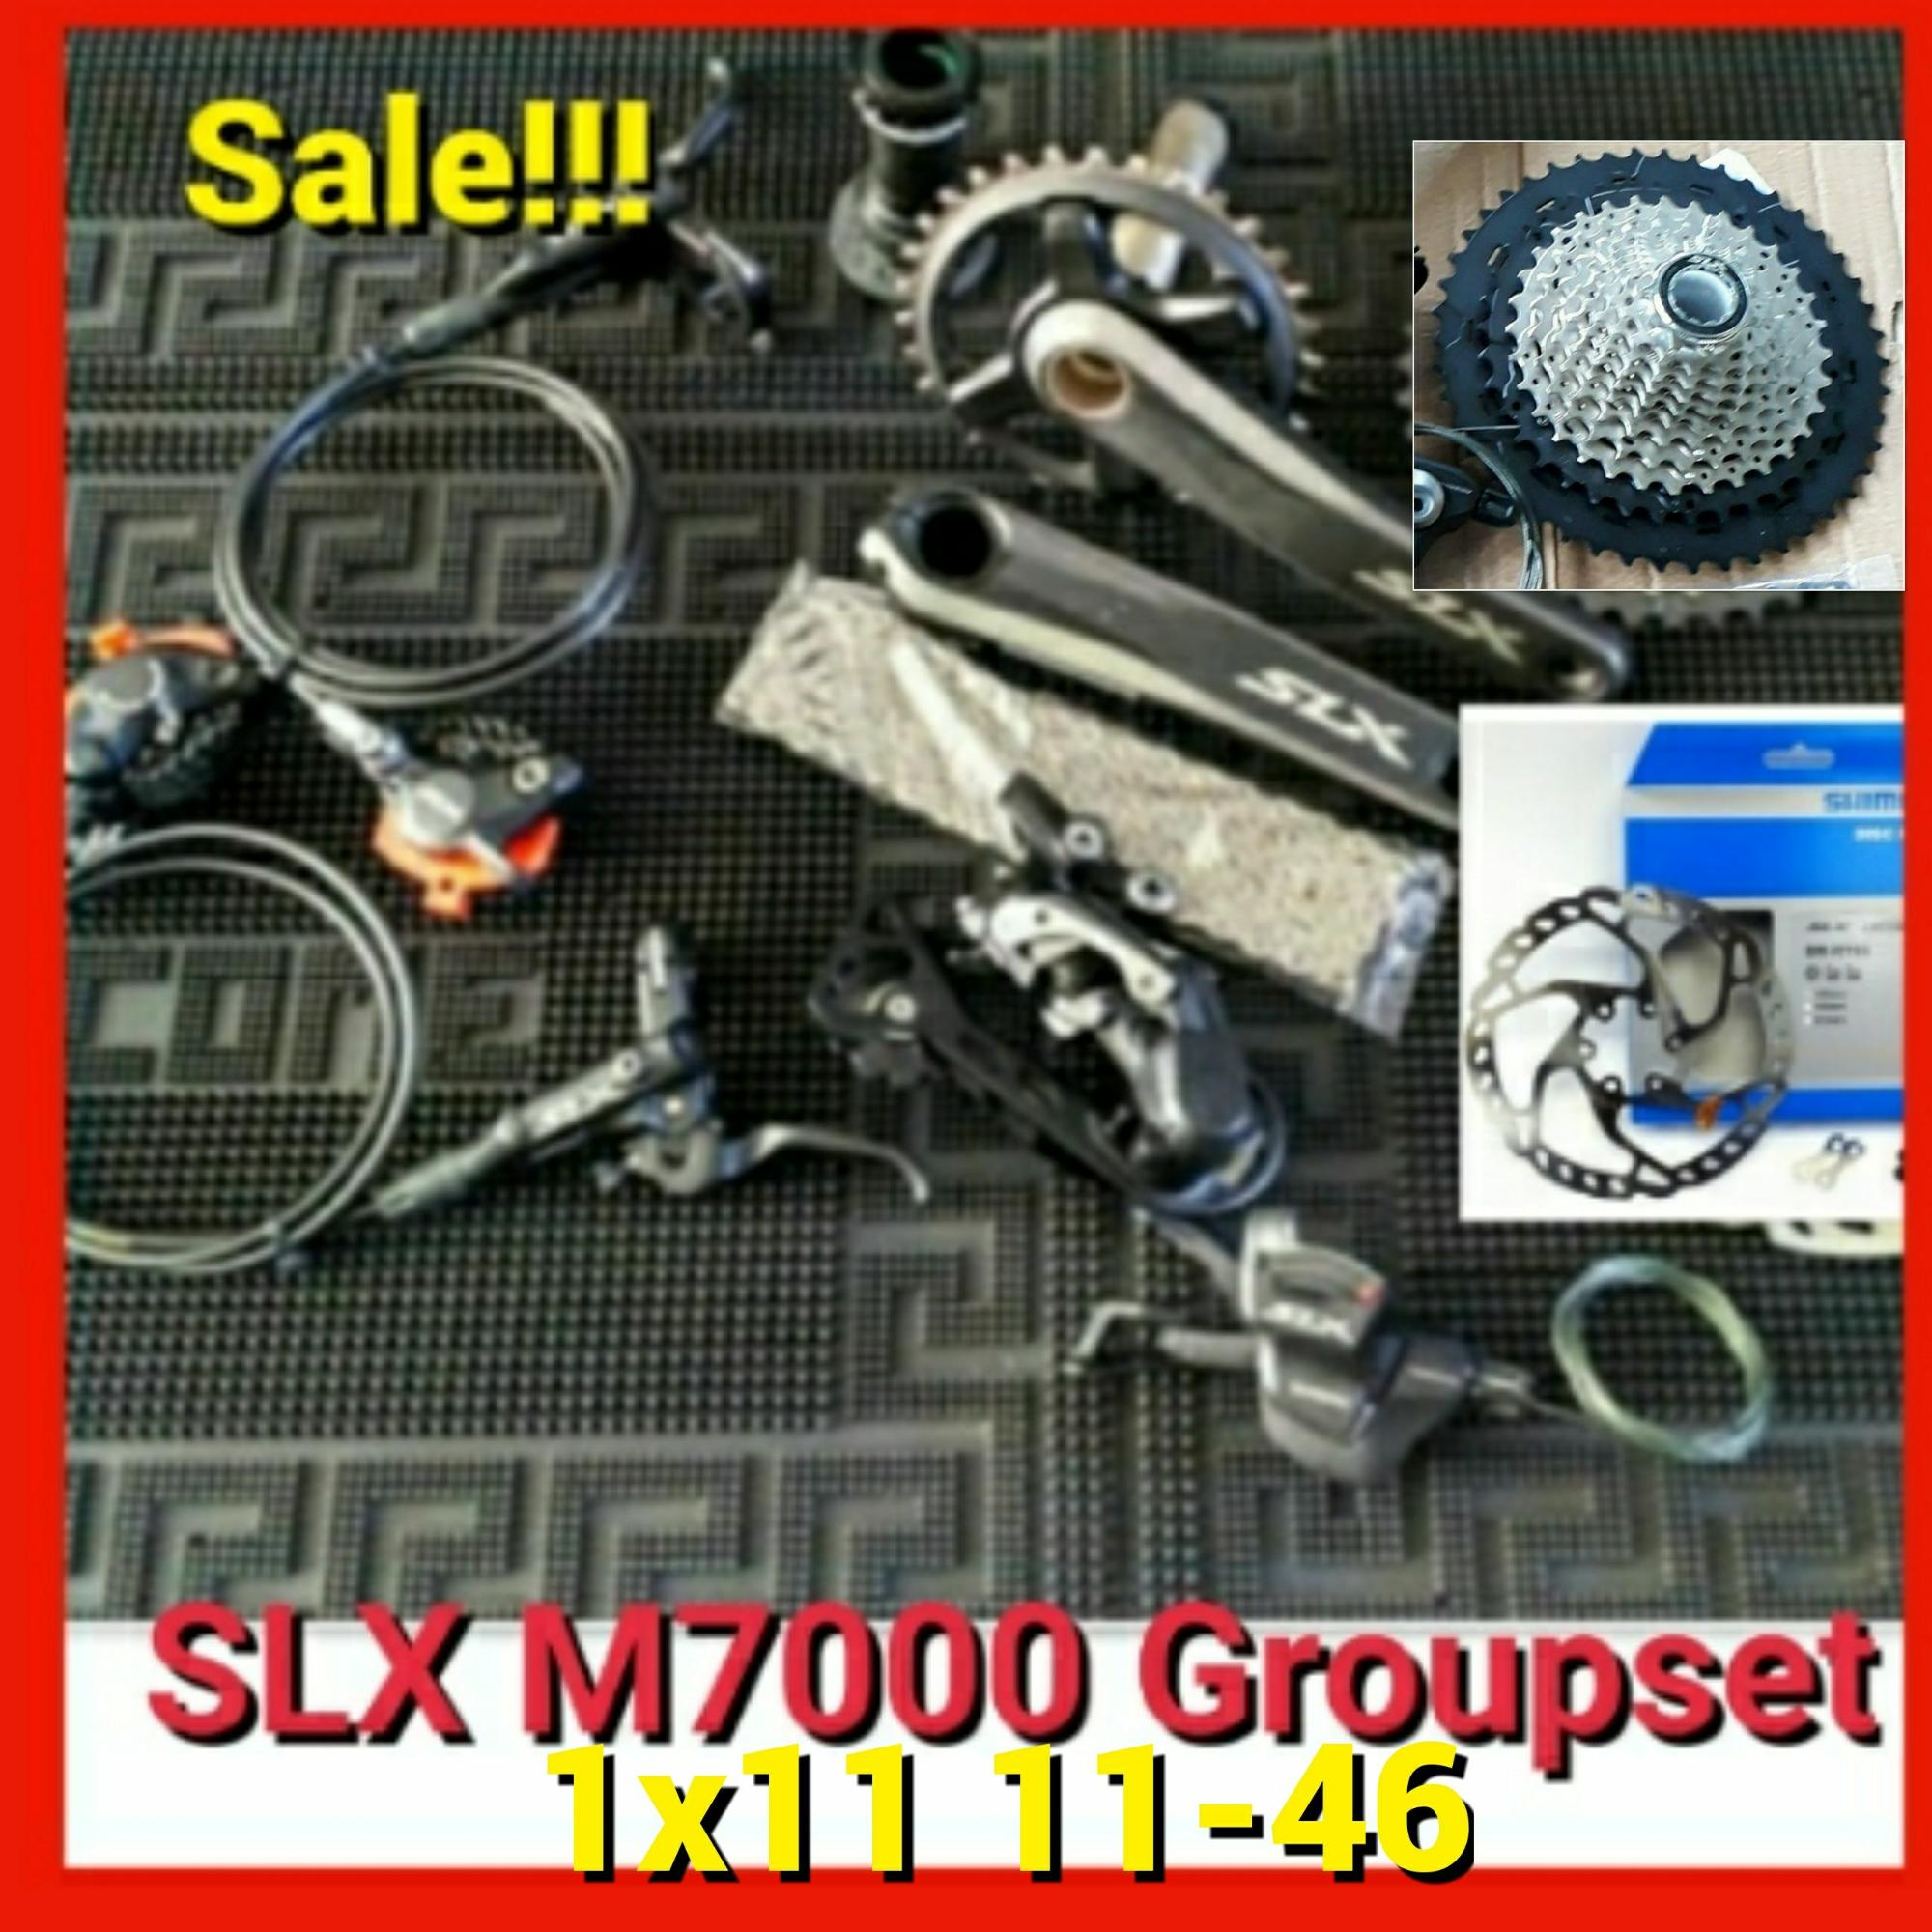 Shimano Philippines Bike Parts For Sale Prices Reviews Groupset Alivio 9 Speed M4000 Slx M7000 1x11 11 46